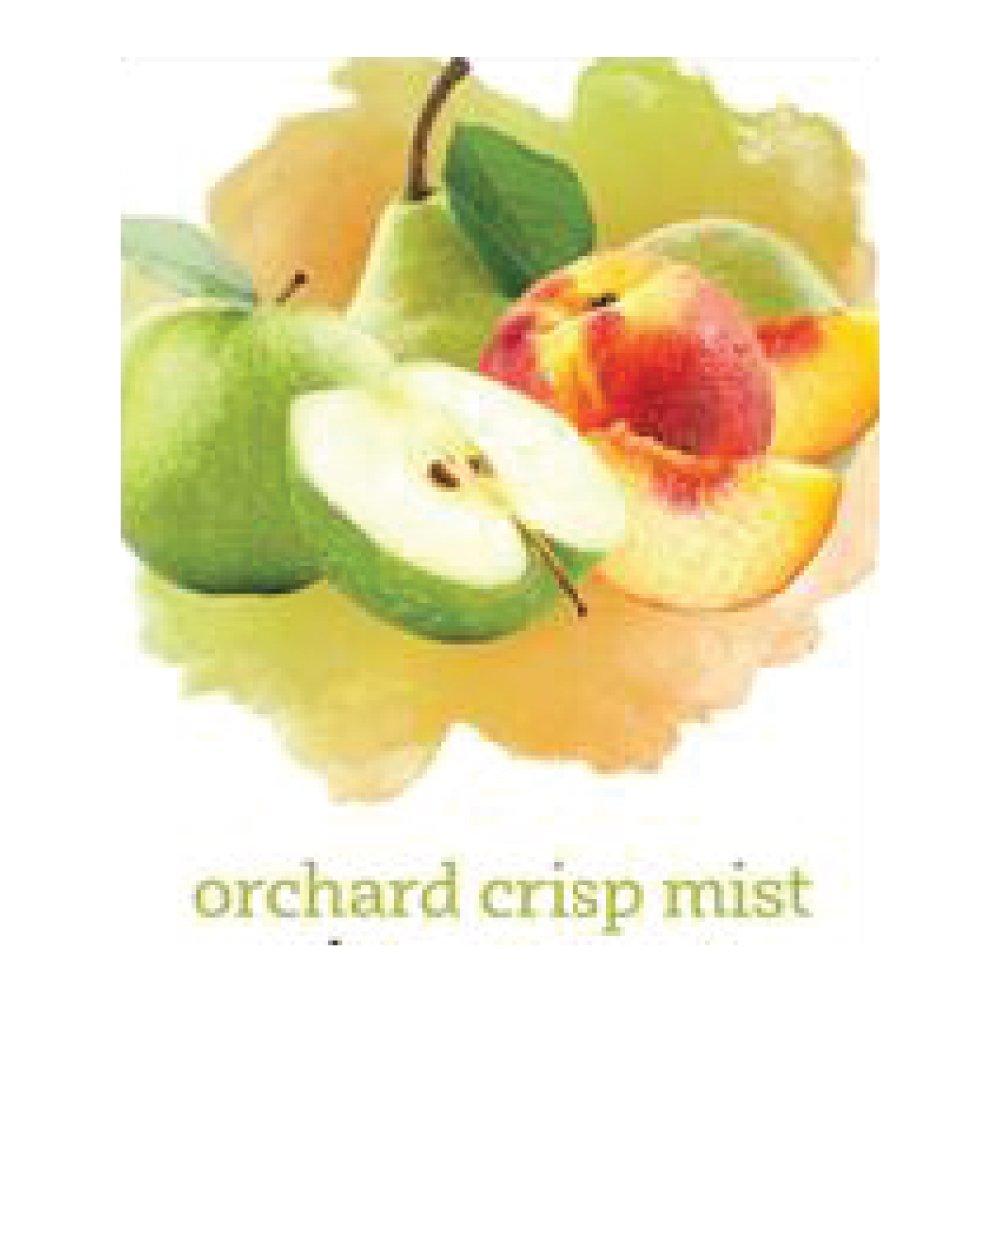 Niagara Mist Orchard Crisp Riesling Fruit Wine Kit